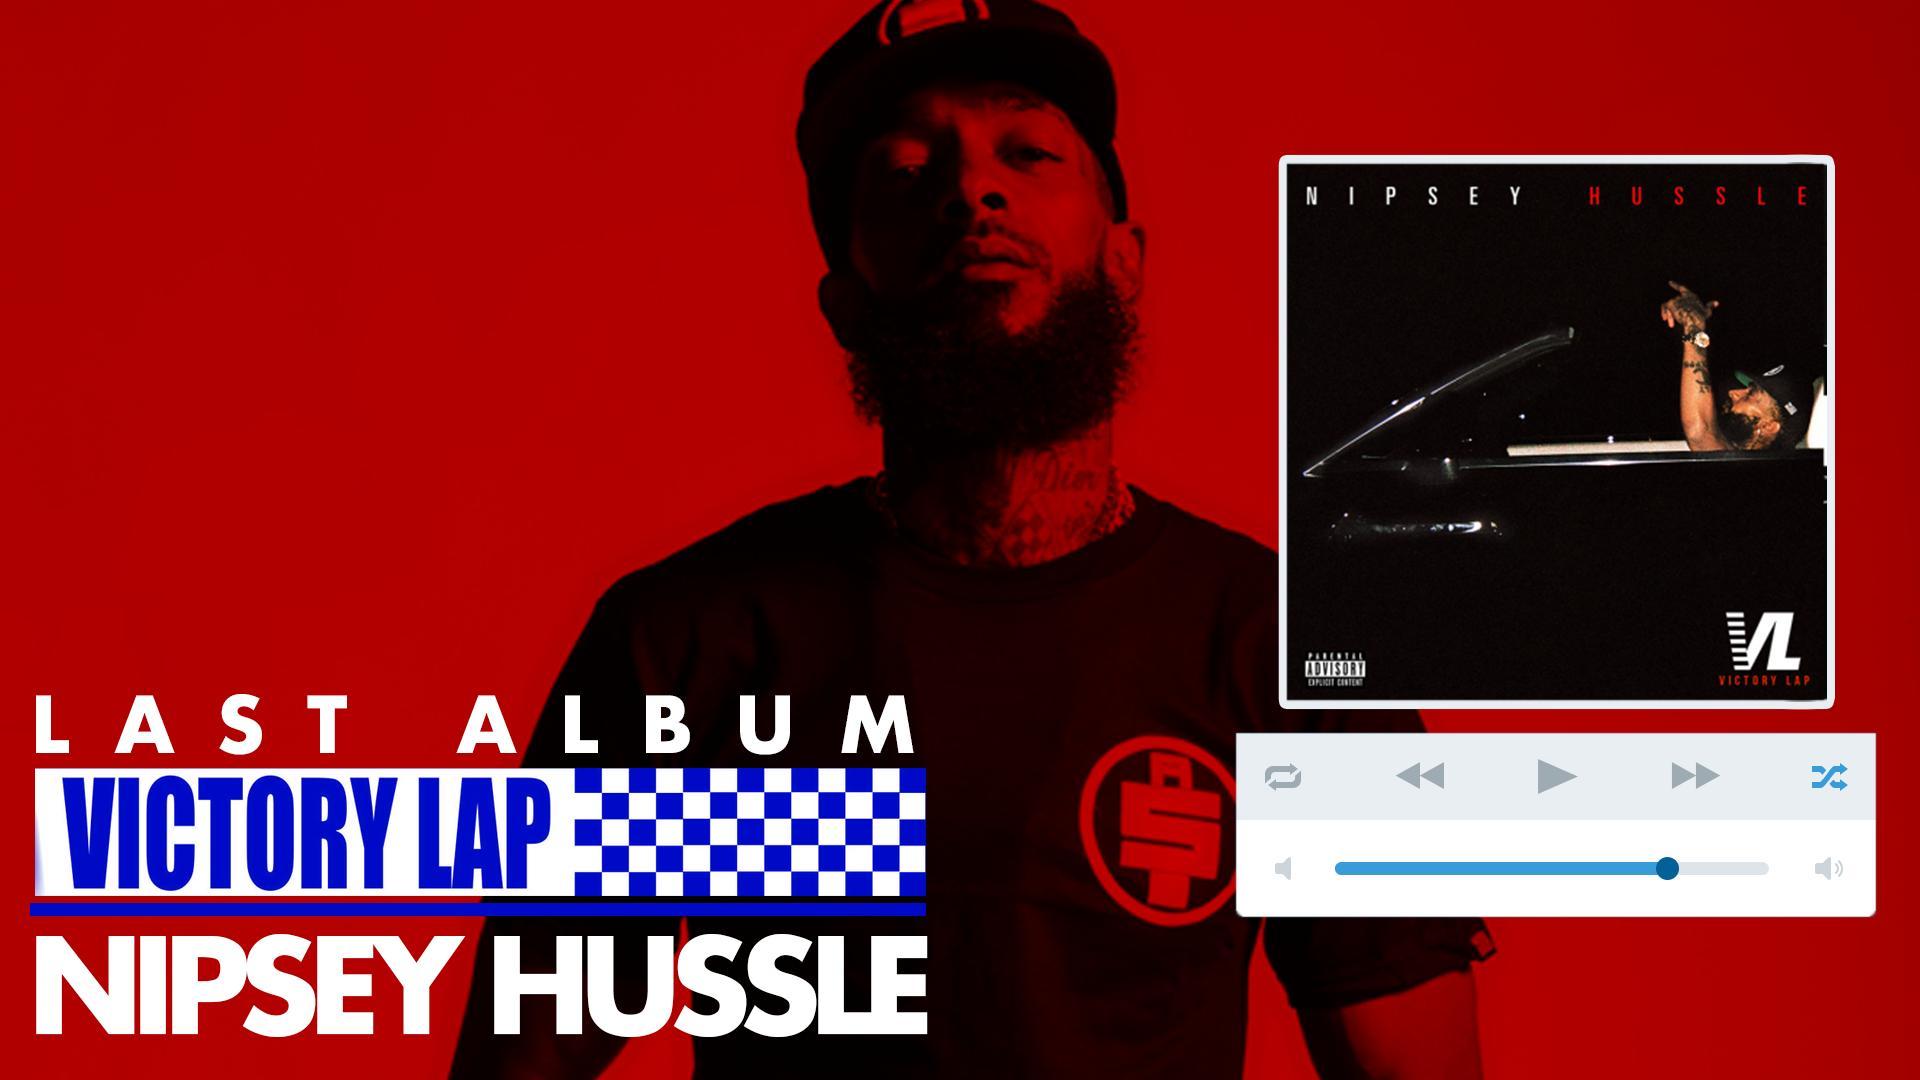 Nipsey hussle victory lap album download zip